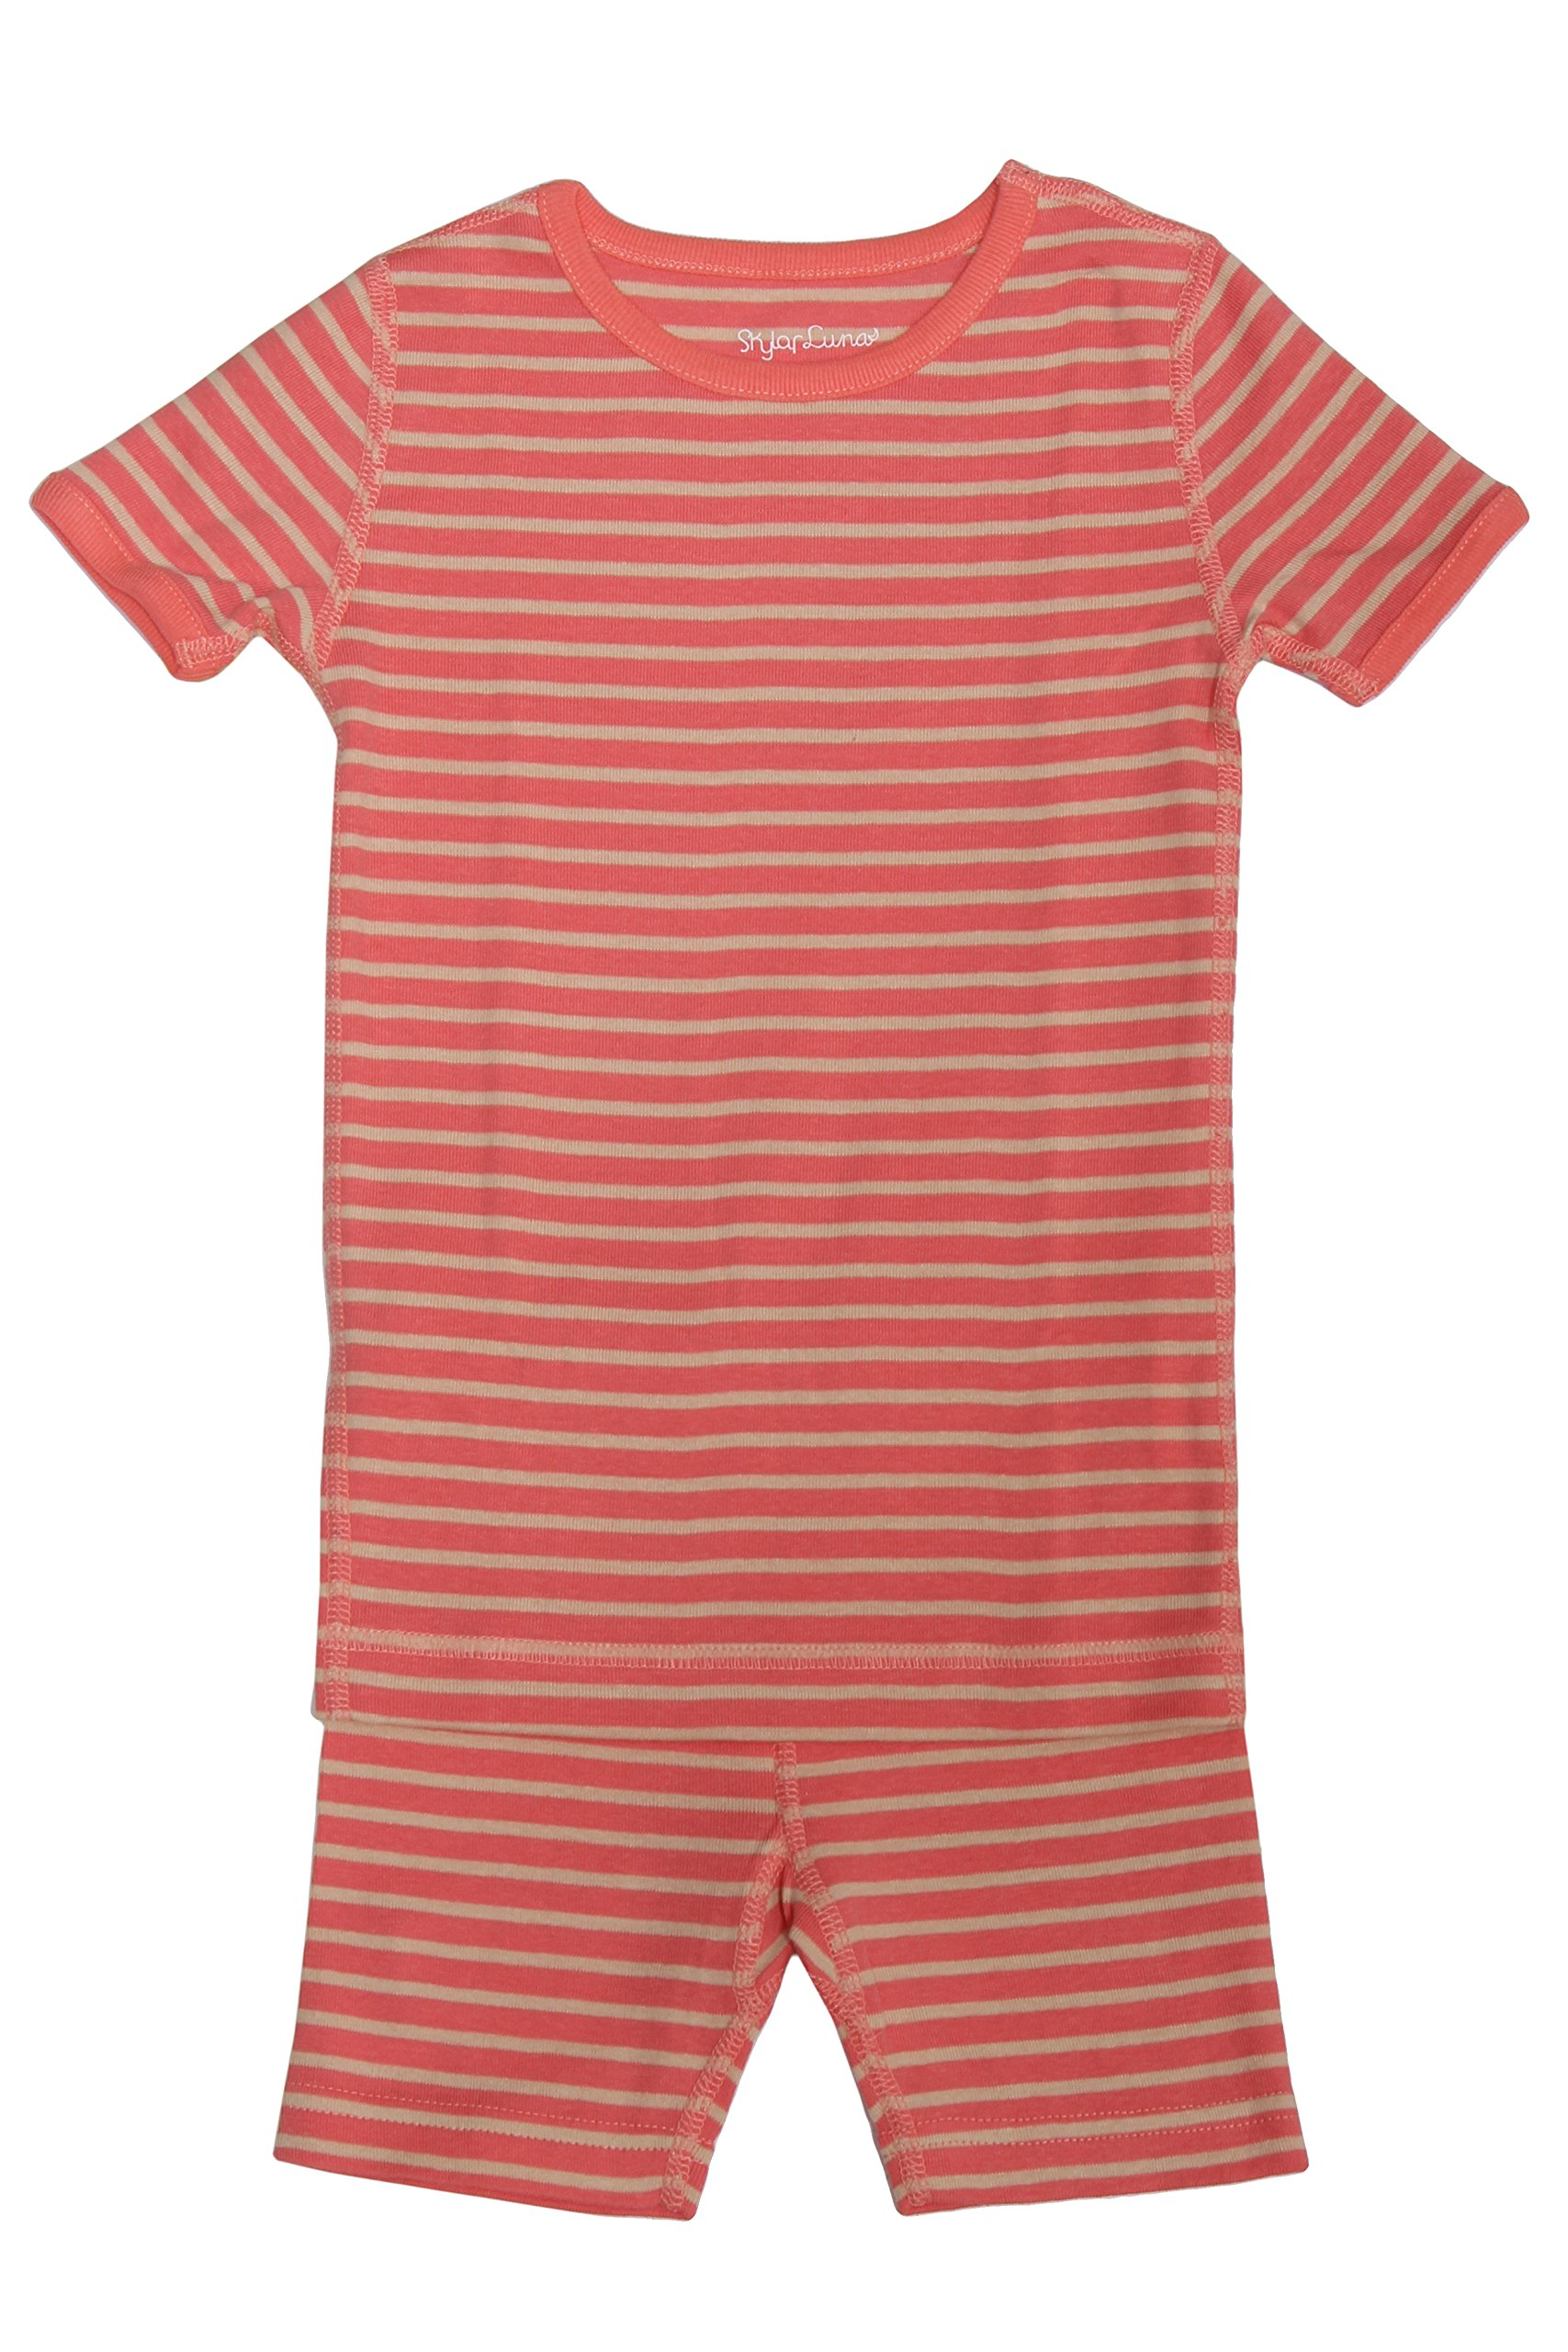 Skylar Luna Girl's Short Sleeve Stripe Pajama Set – 100% Organic Cotton Shirt Shorts – Coral/Oatmeal - Sizes 8